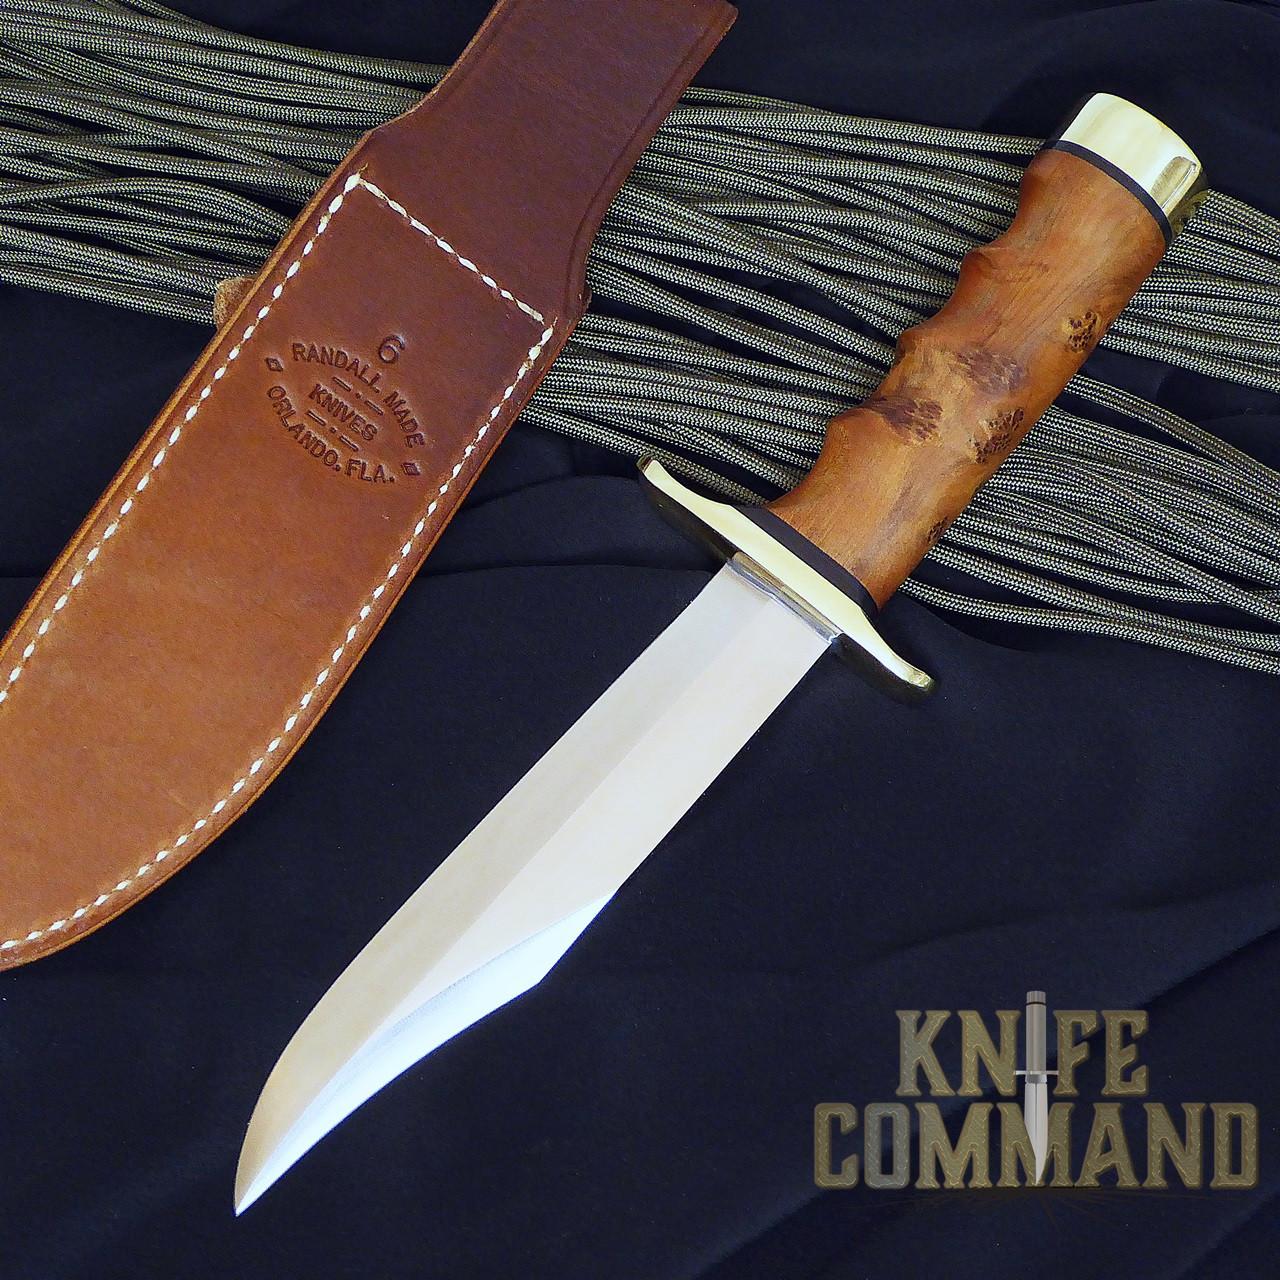 Randall Sportsman Bowie Knives